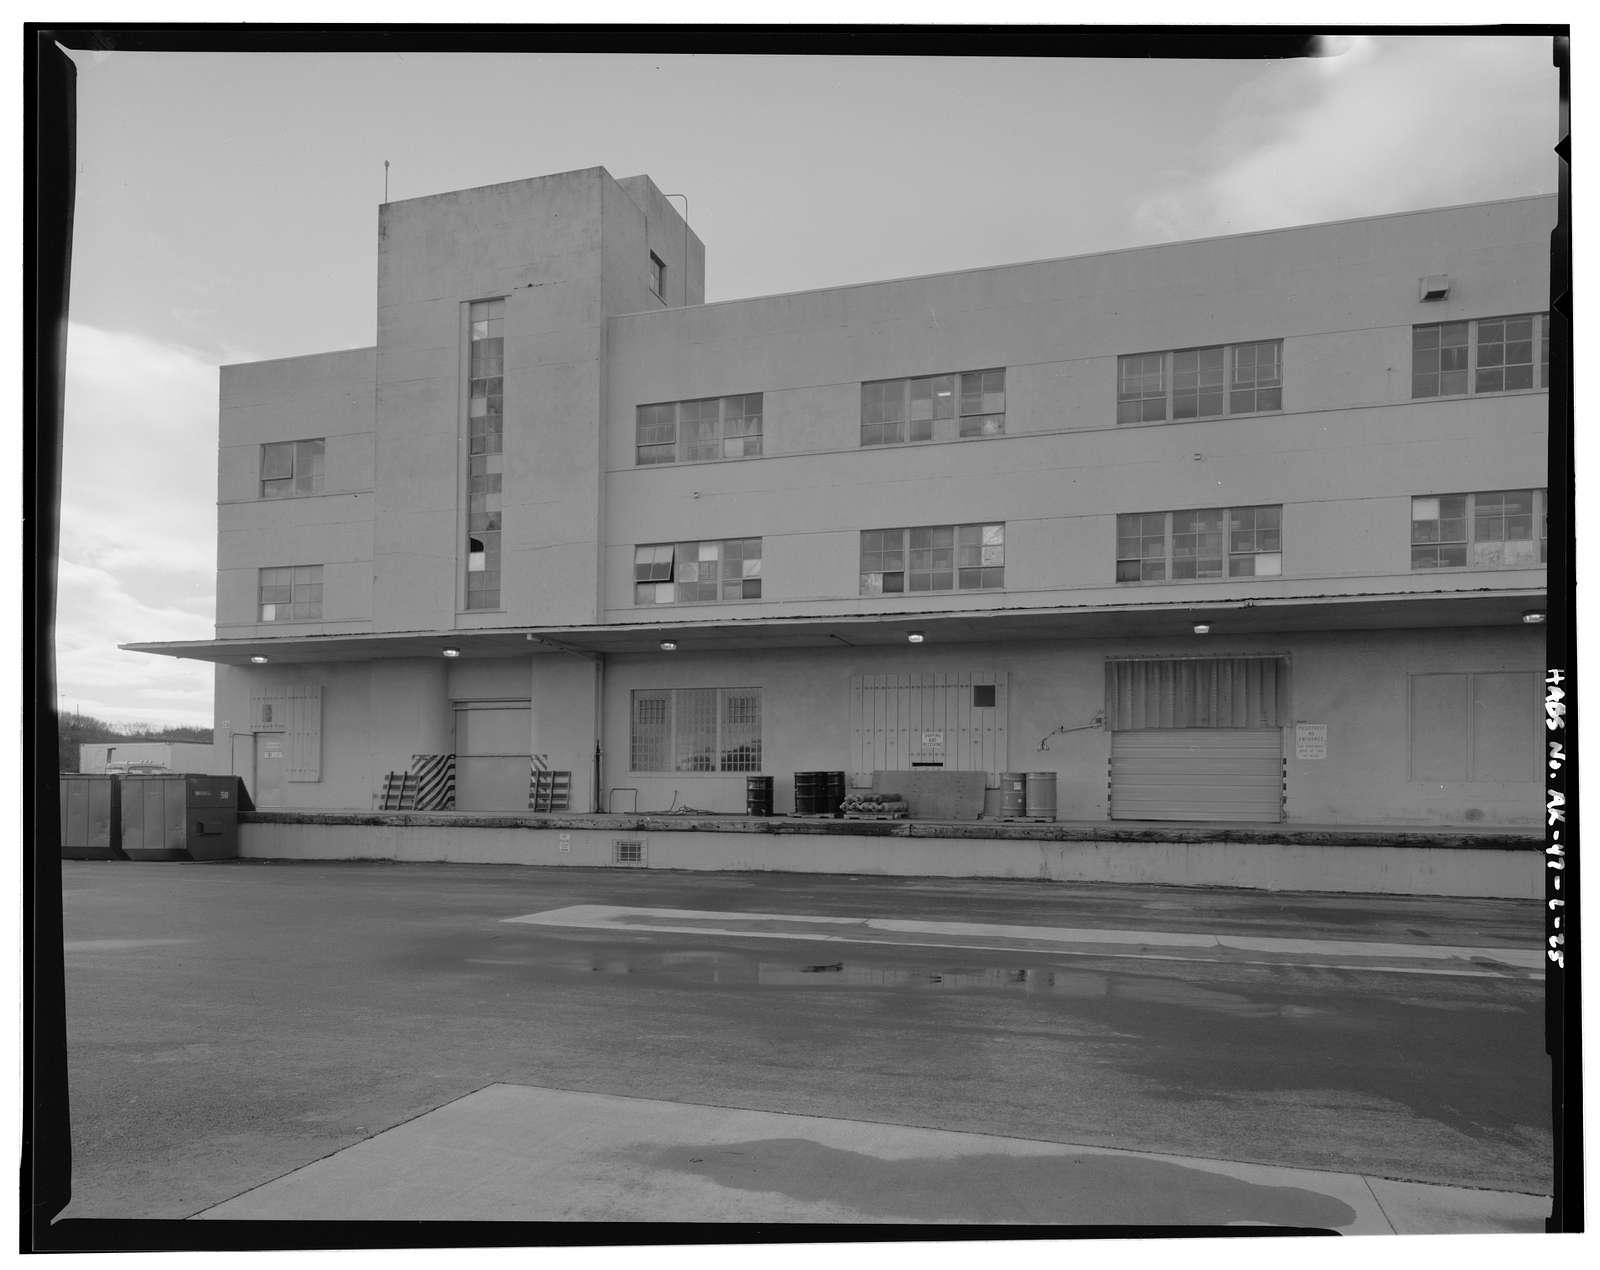 Kodiak Naval Operating Base, General Storehouse, U.S. Coast Guard Station, Kodiak, Kodiak Island Borough, AK